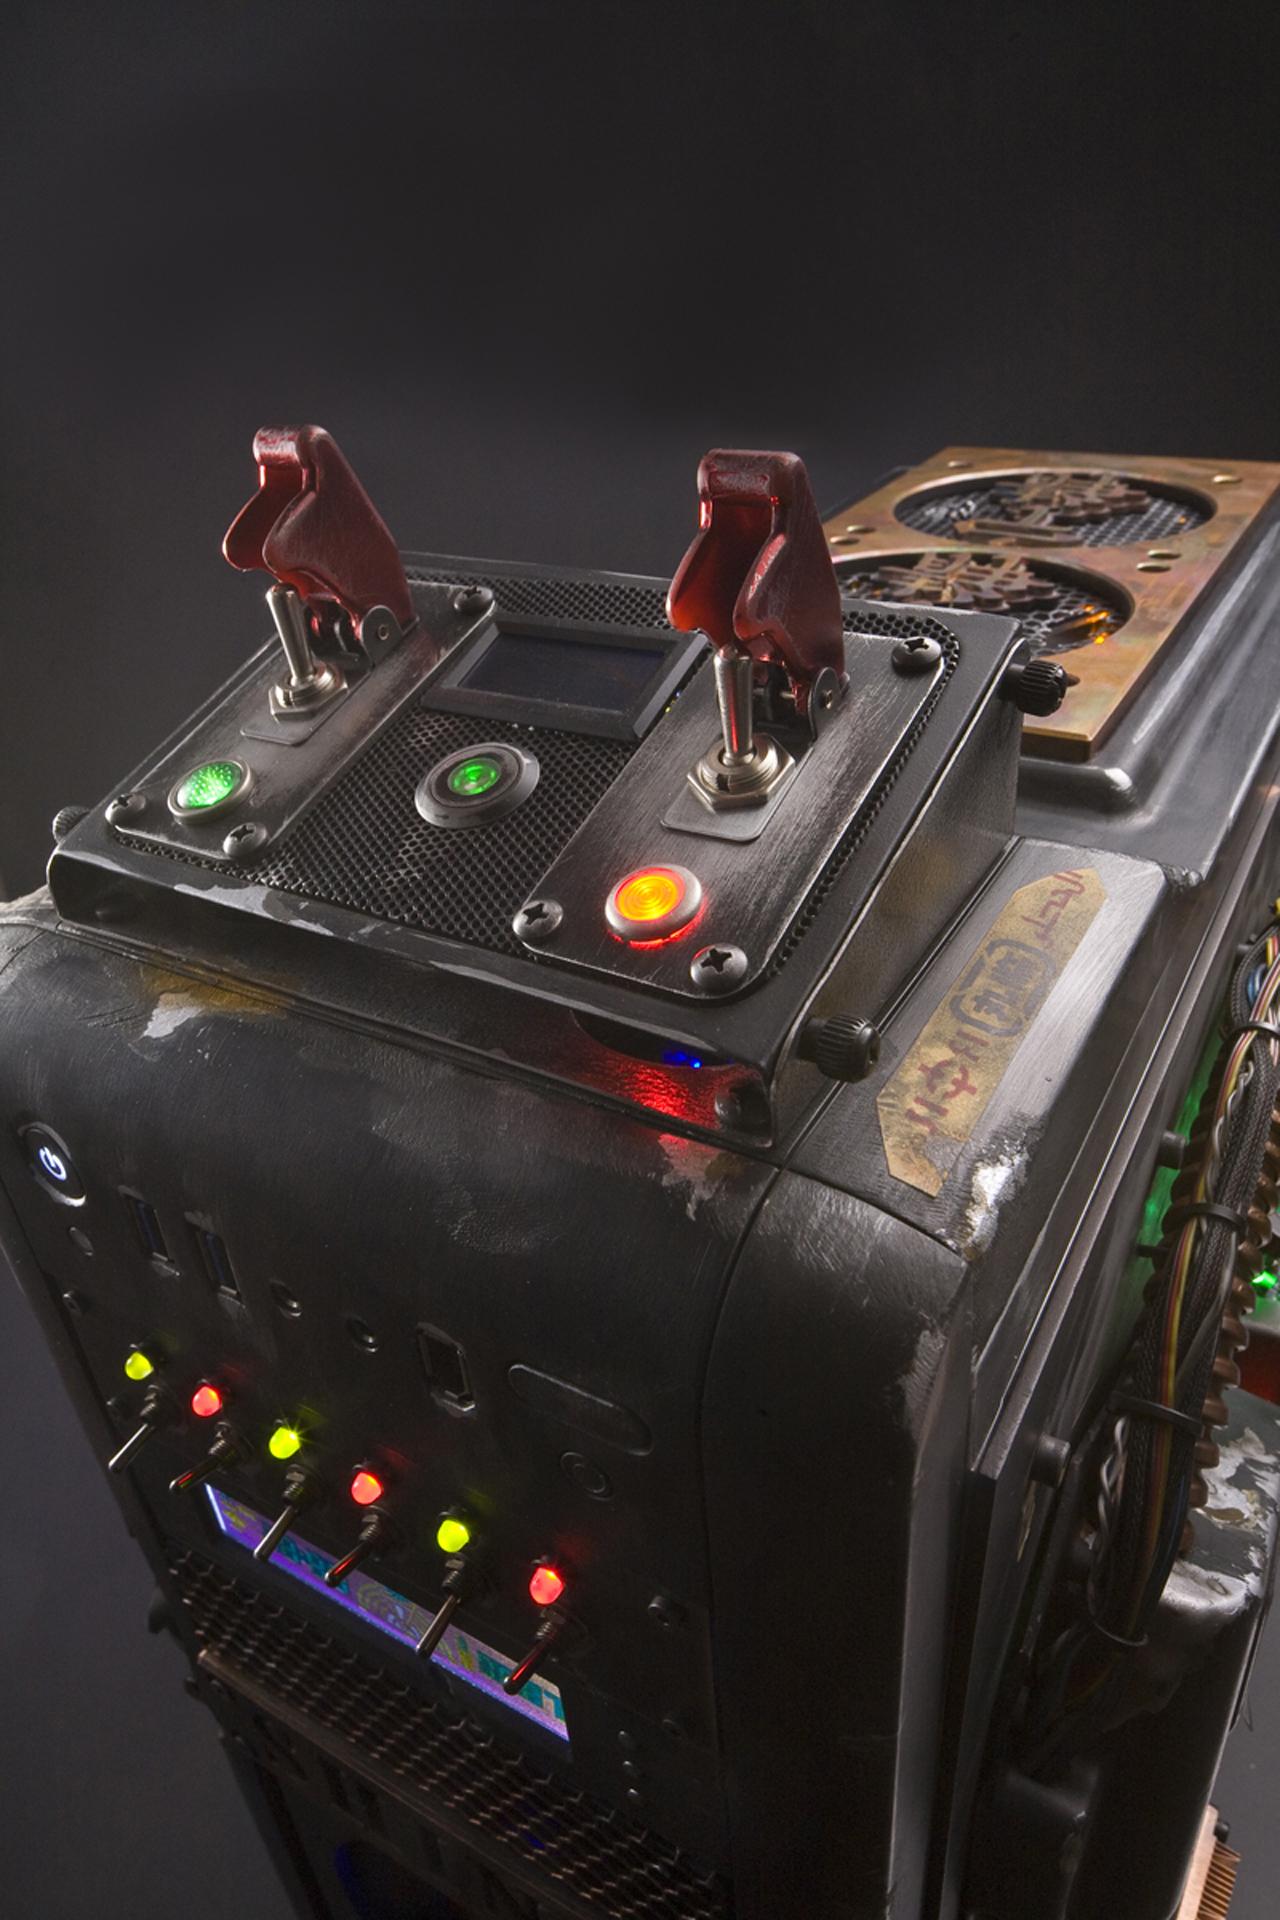 2gb ram mobile ford capri mk1 wiring diagram shiny case mod | megagames